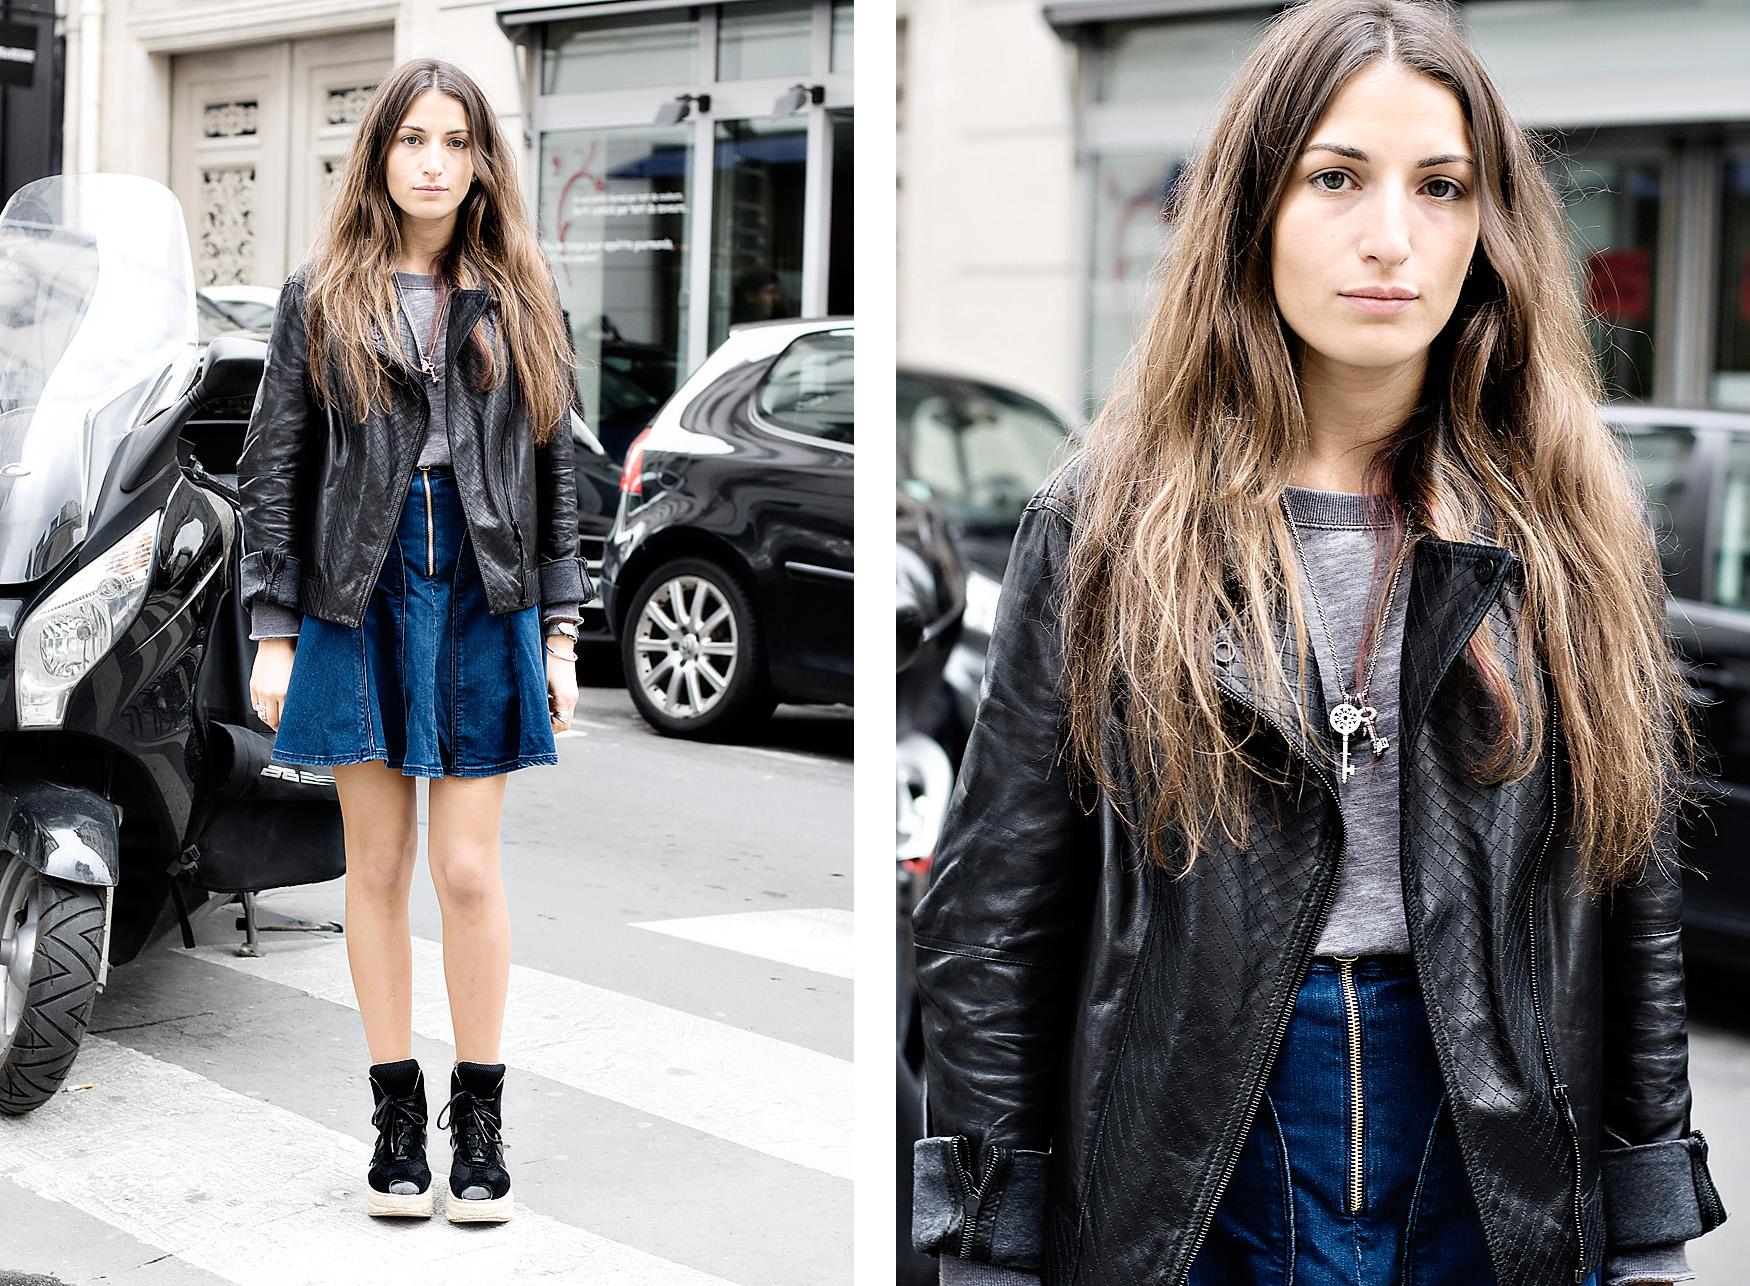 Denim Jacket And Leather Skirt - Skirts